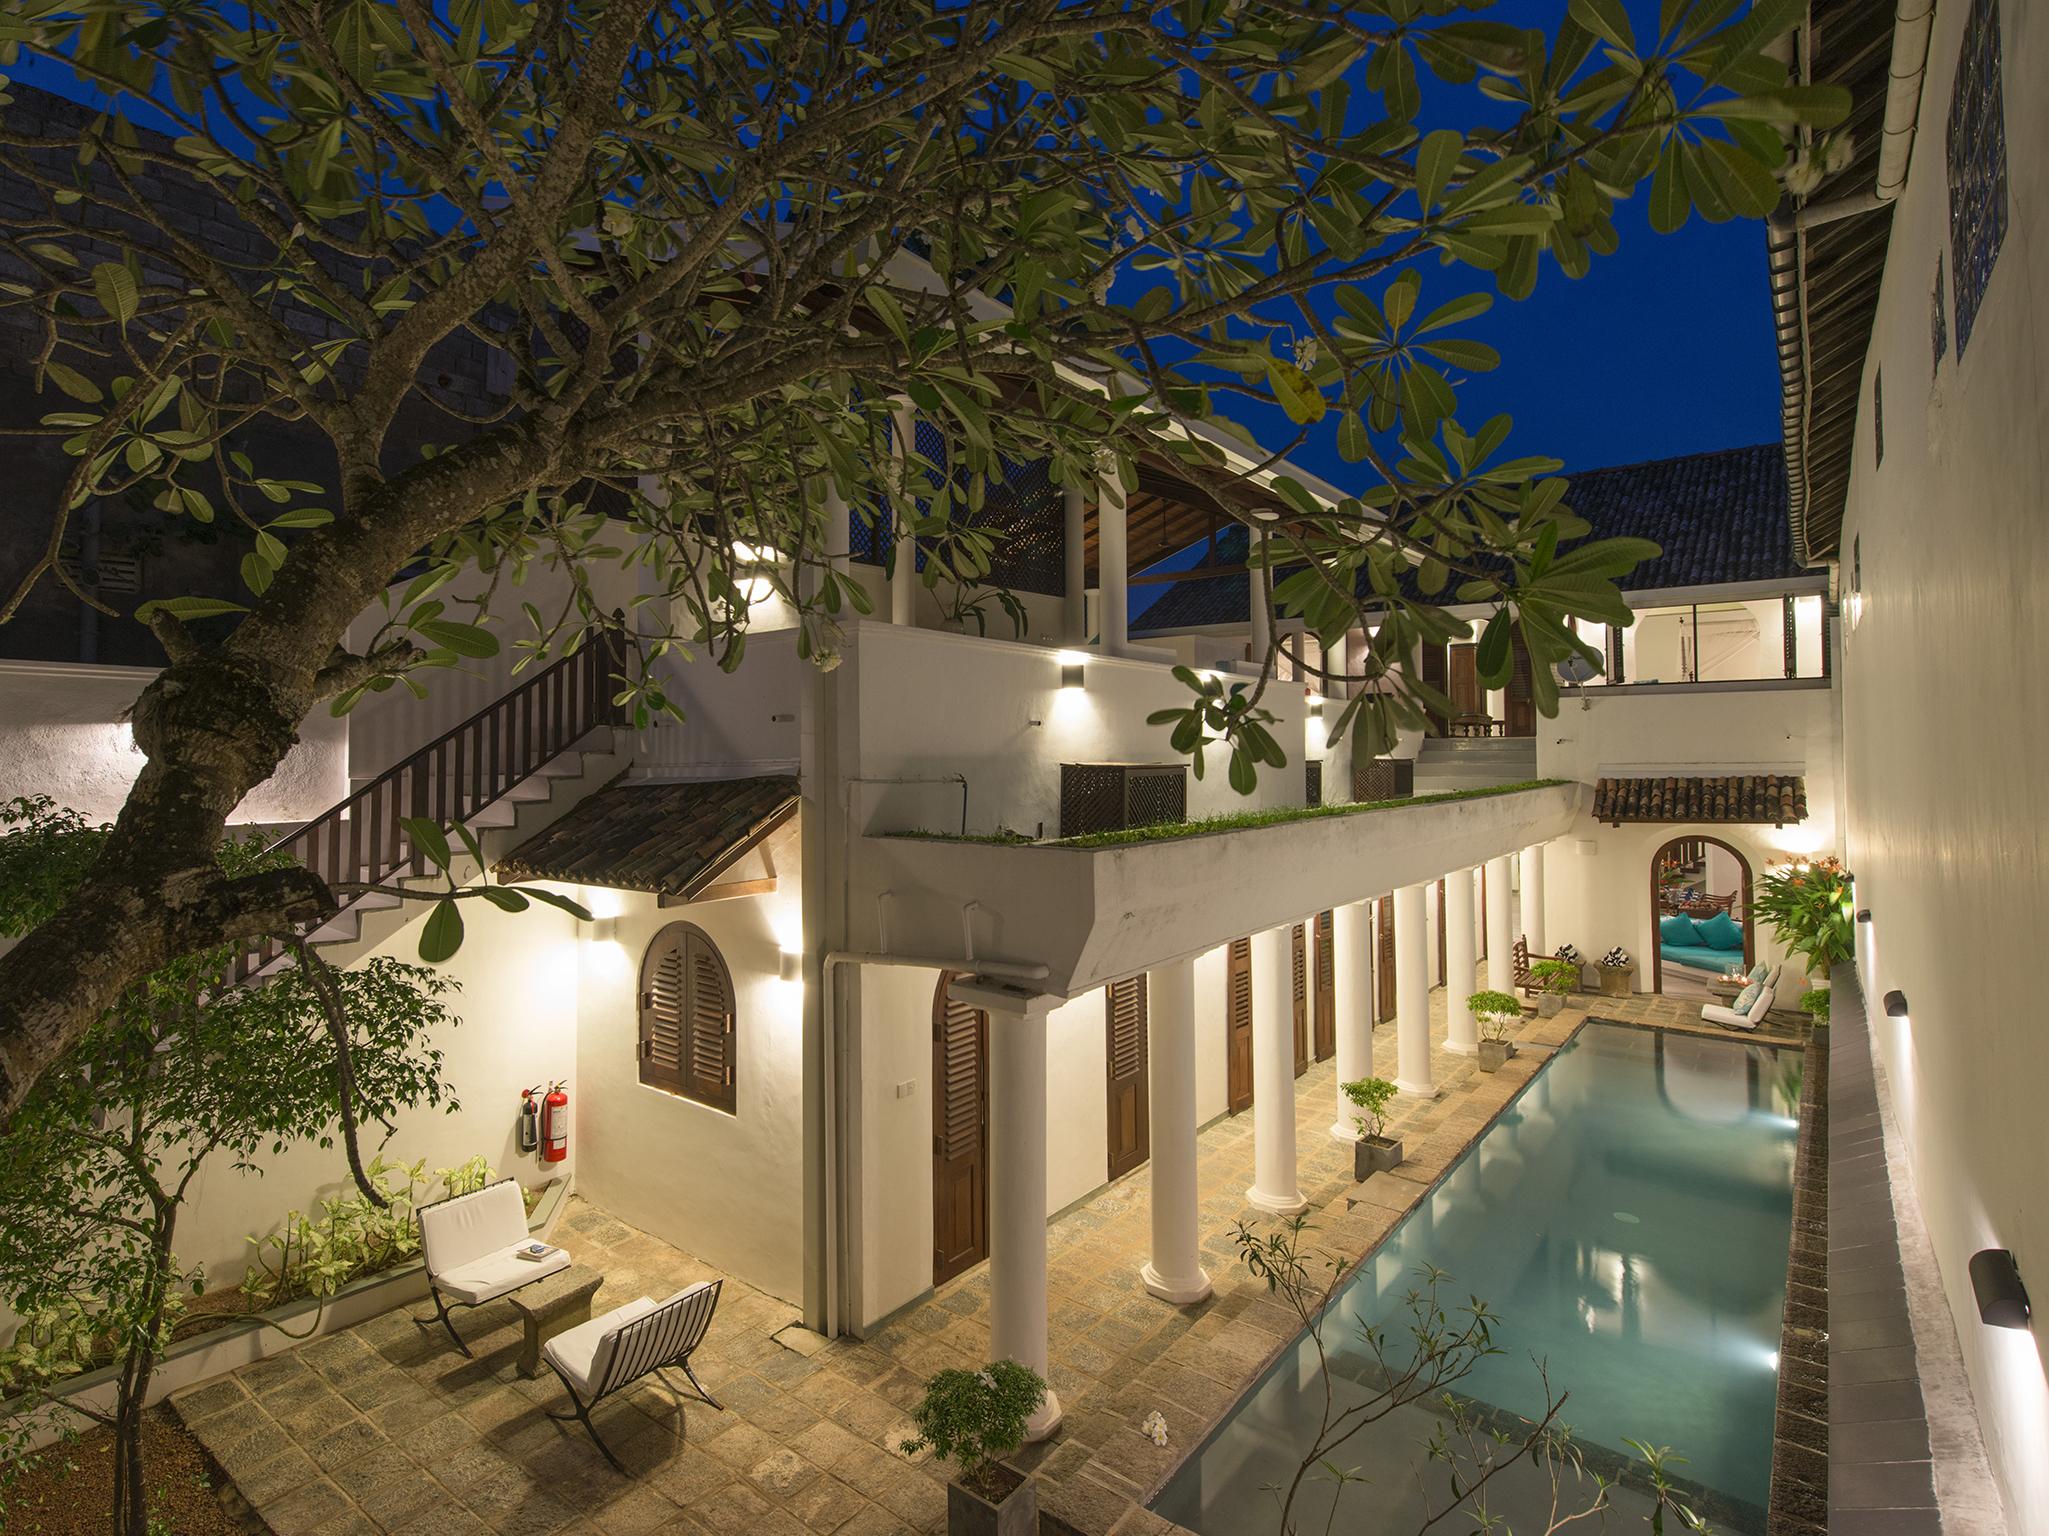 15-Ambassadors House-Galle - Pool aerial at night.jpg